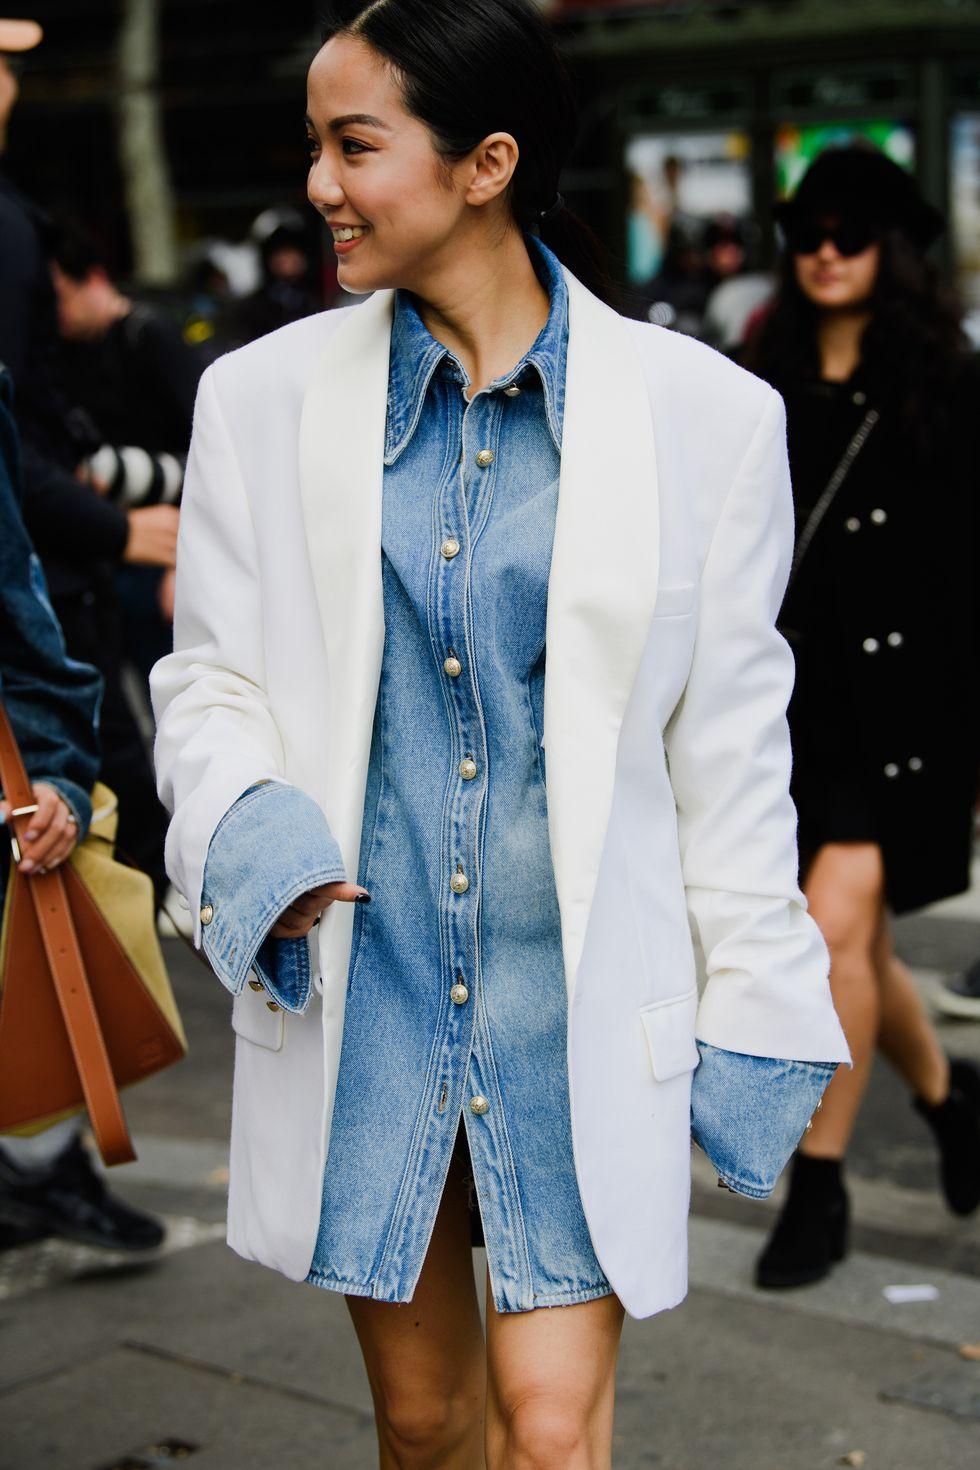 yoyo cao blazer trắng áo denim